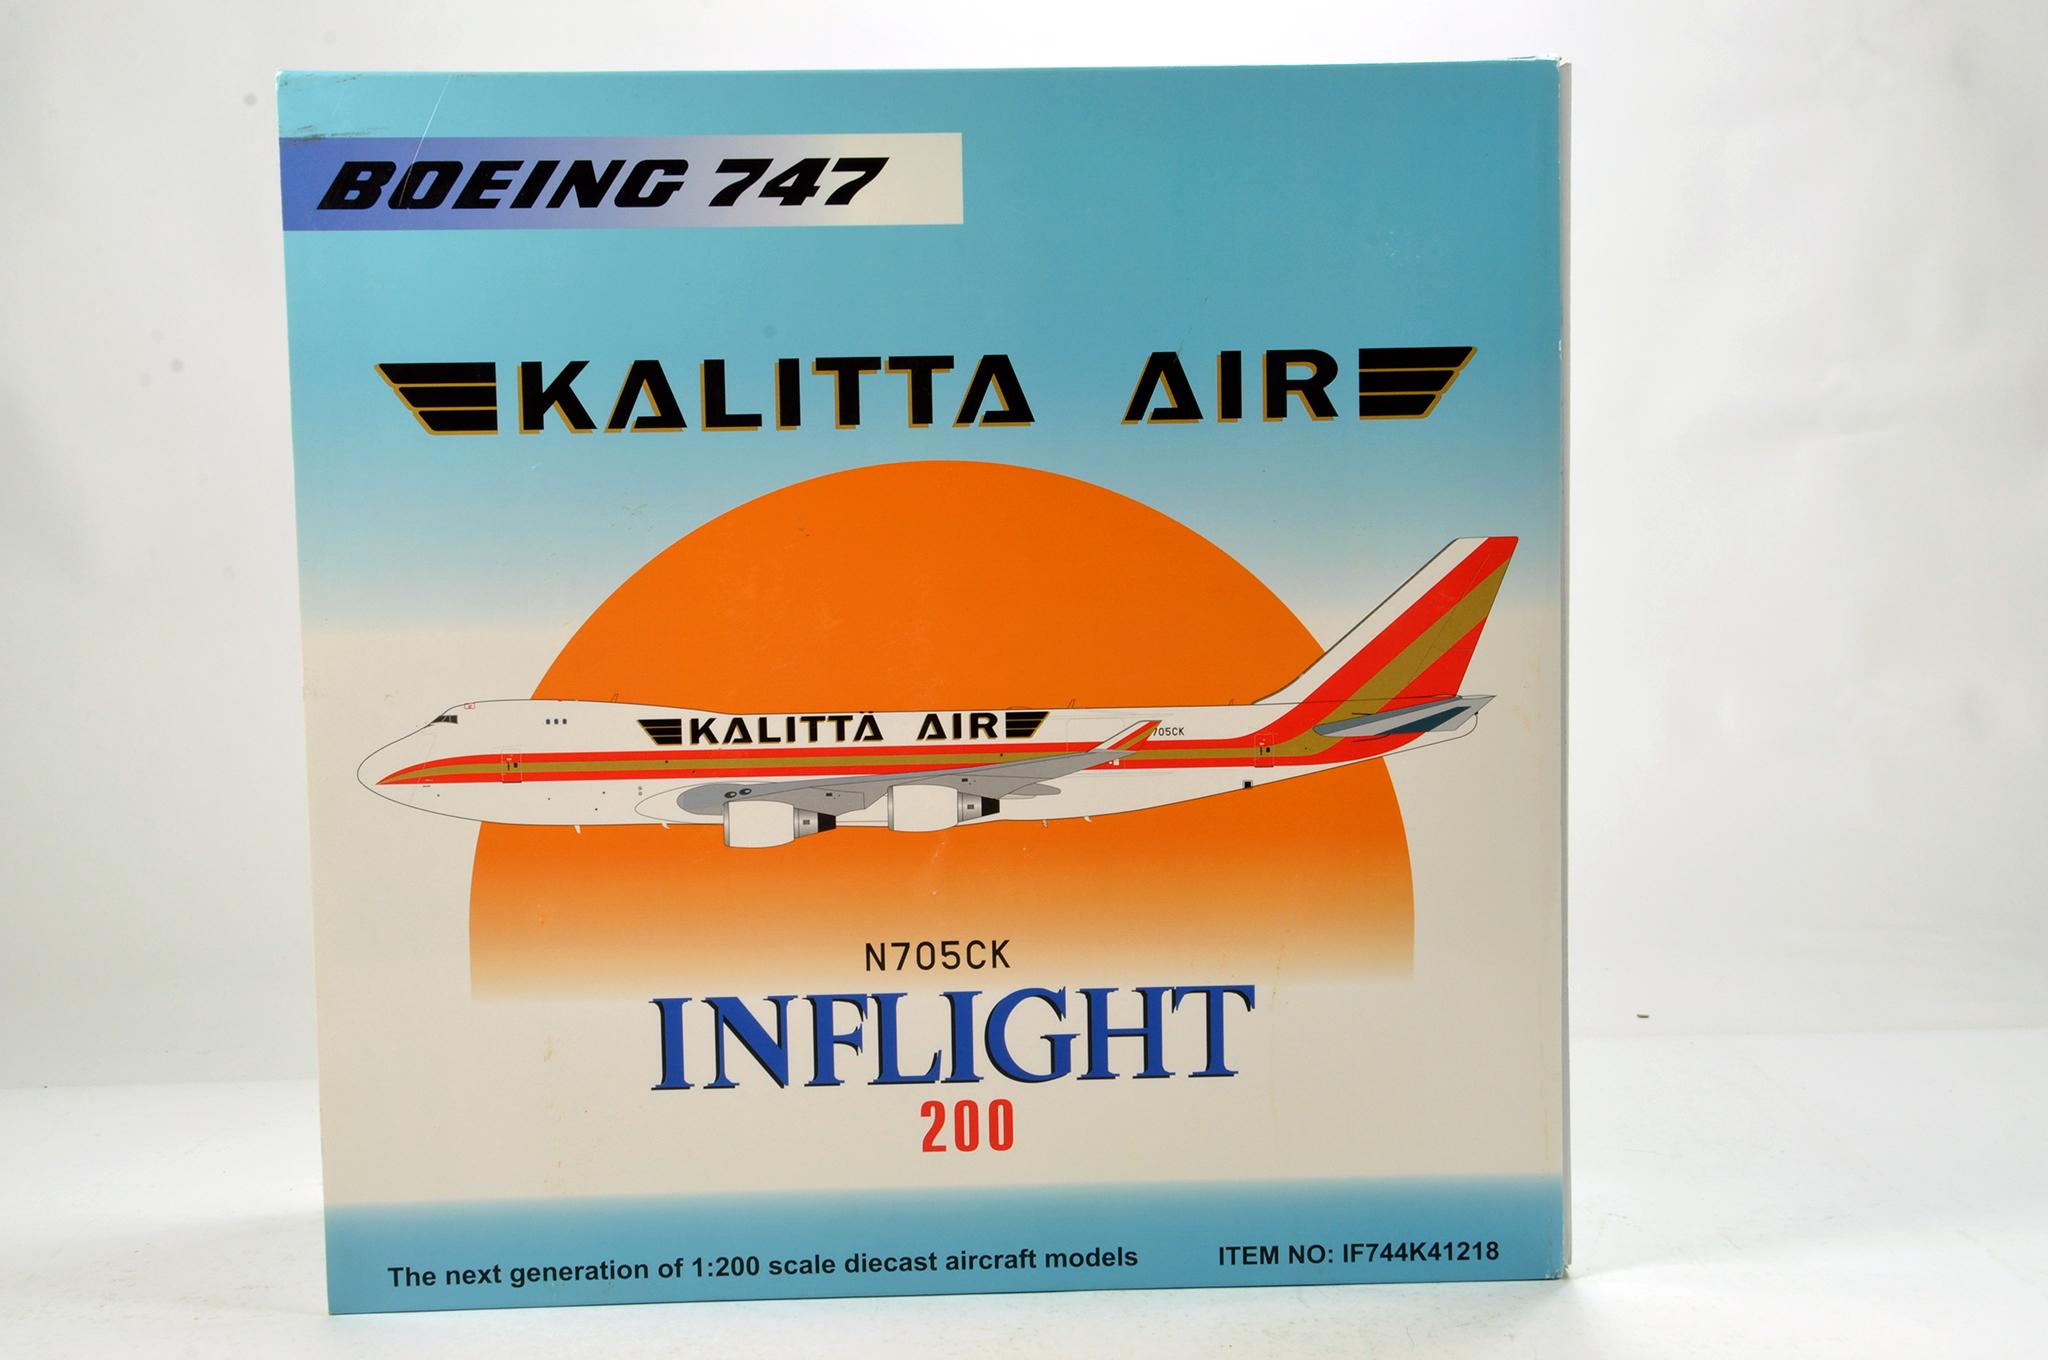 Lot 47 - Inflight Models 1/200 Diecast Aircraft Models comprising Boeing 747 Kalitta Air. Graded ex shop